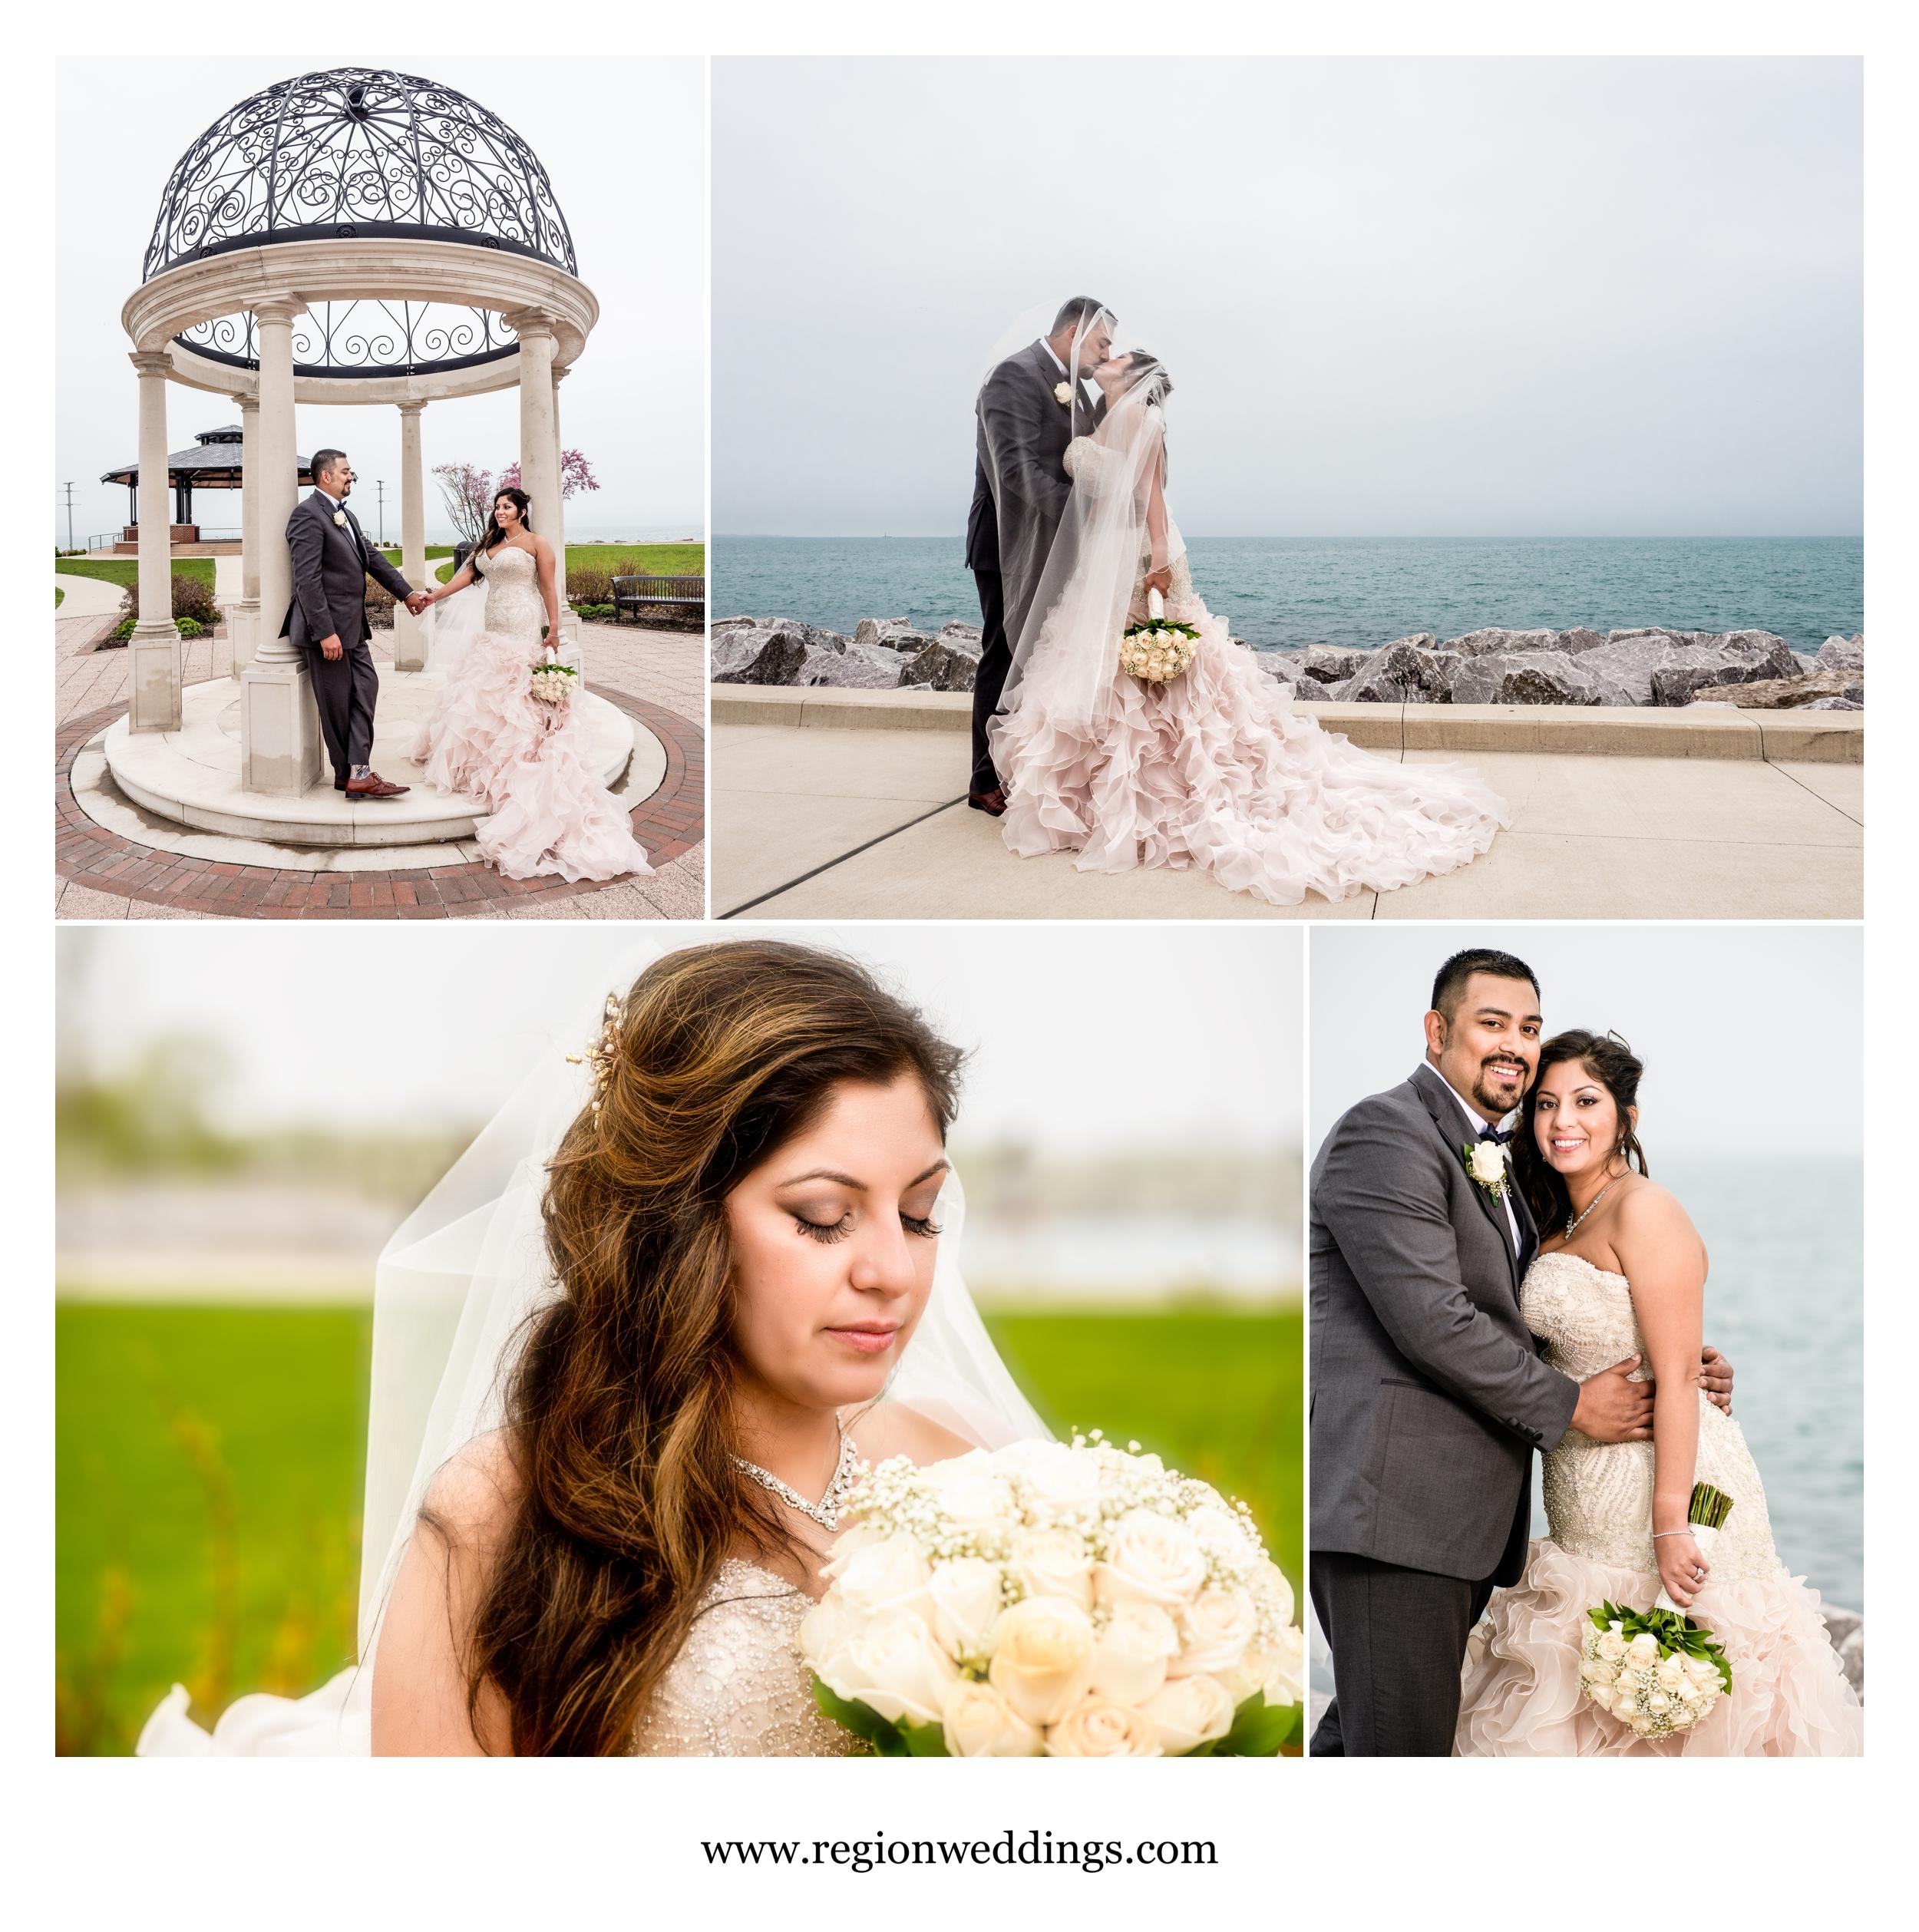 Wedding photos at Whiting Lakefront Park.